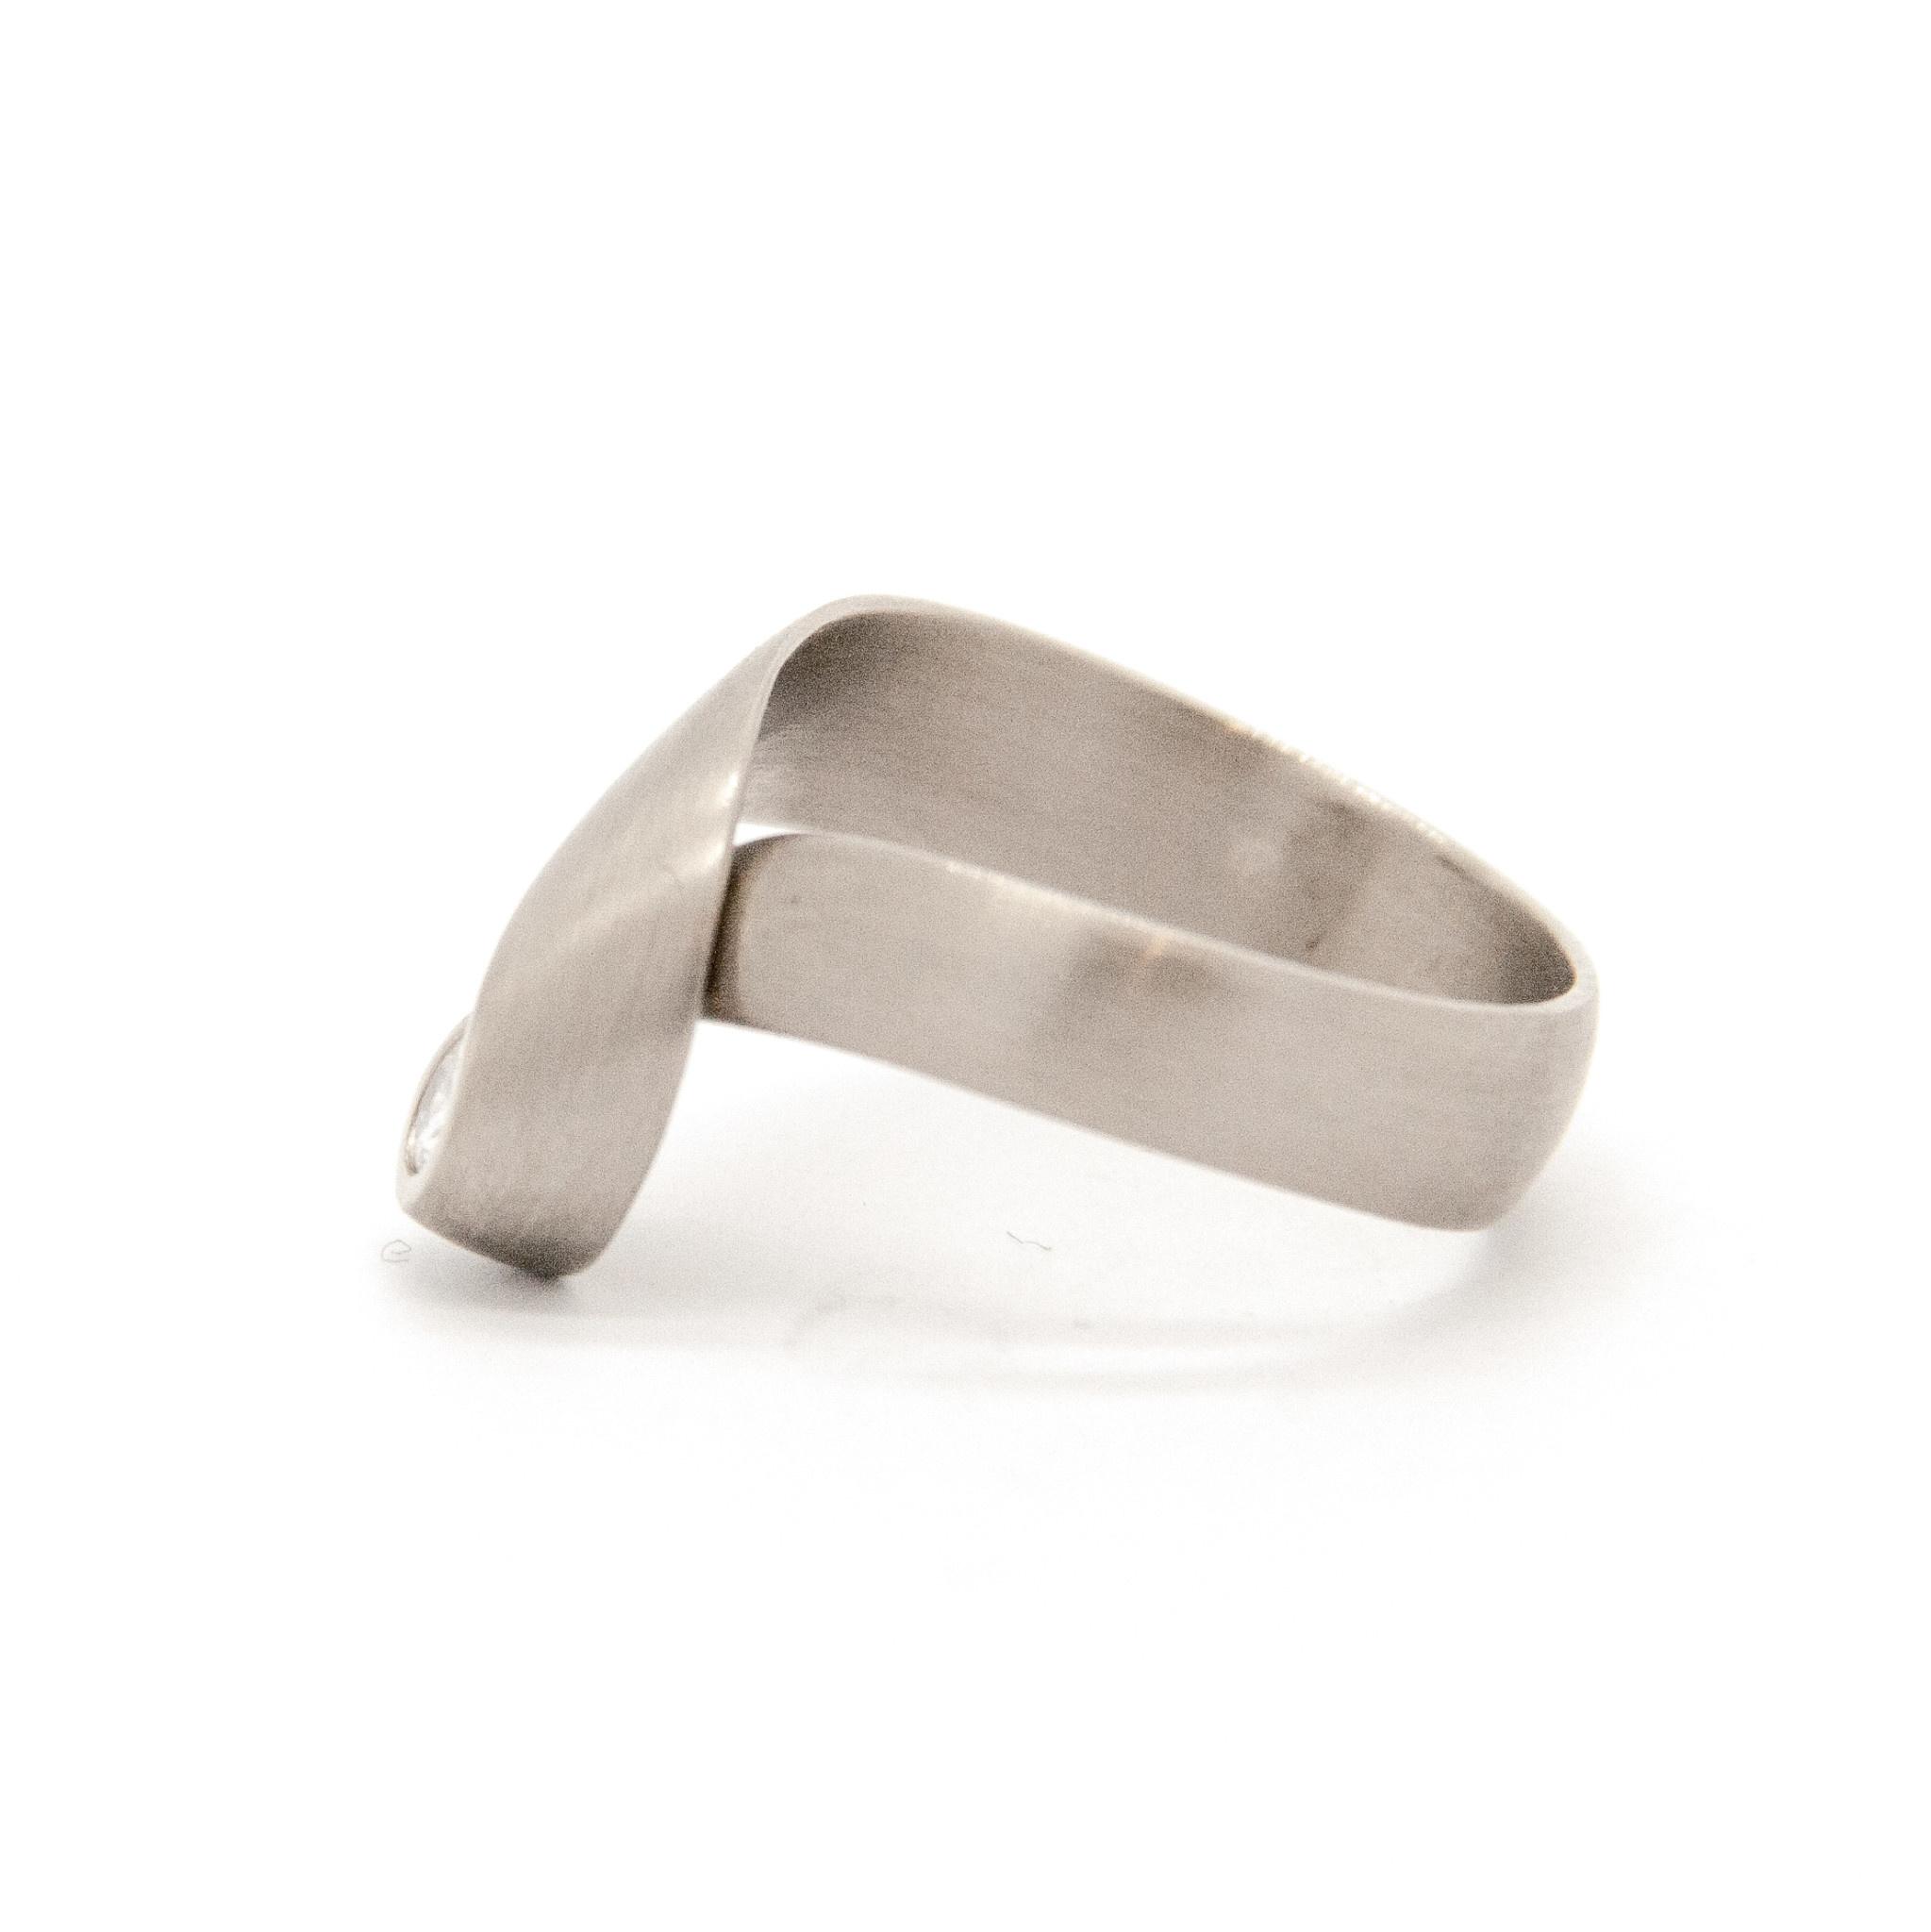 14k white gold ring size 56-10